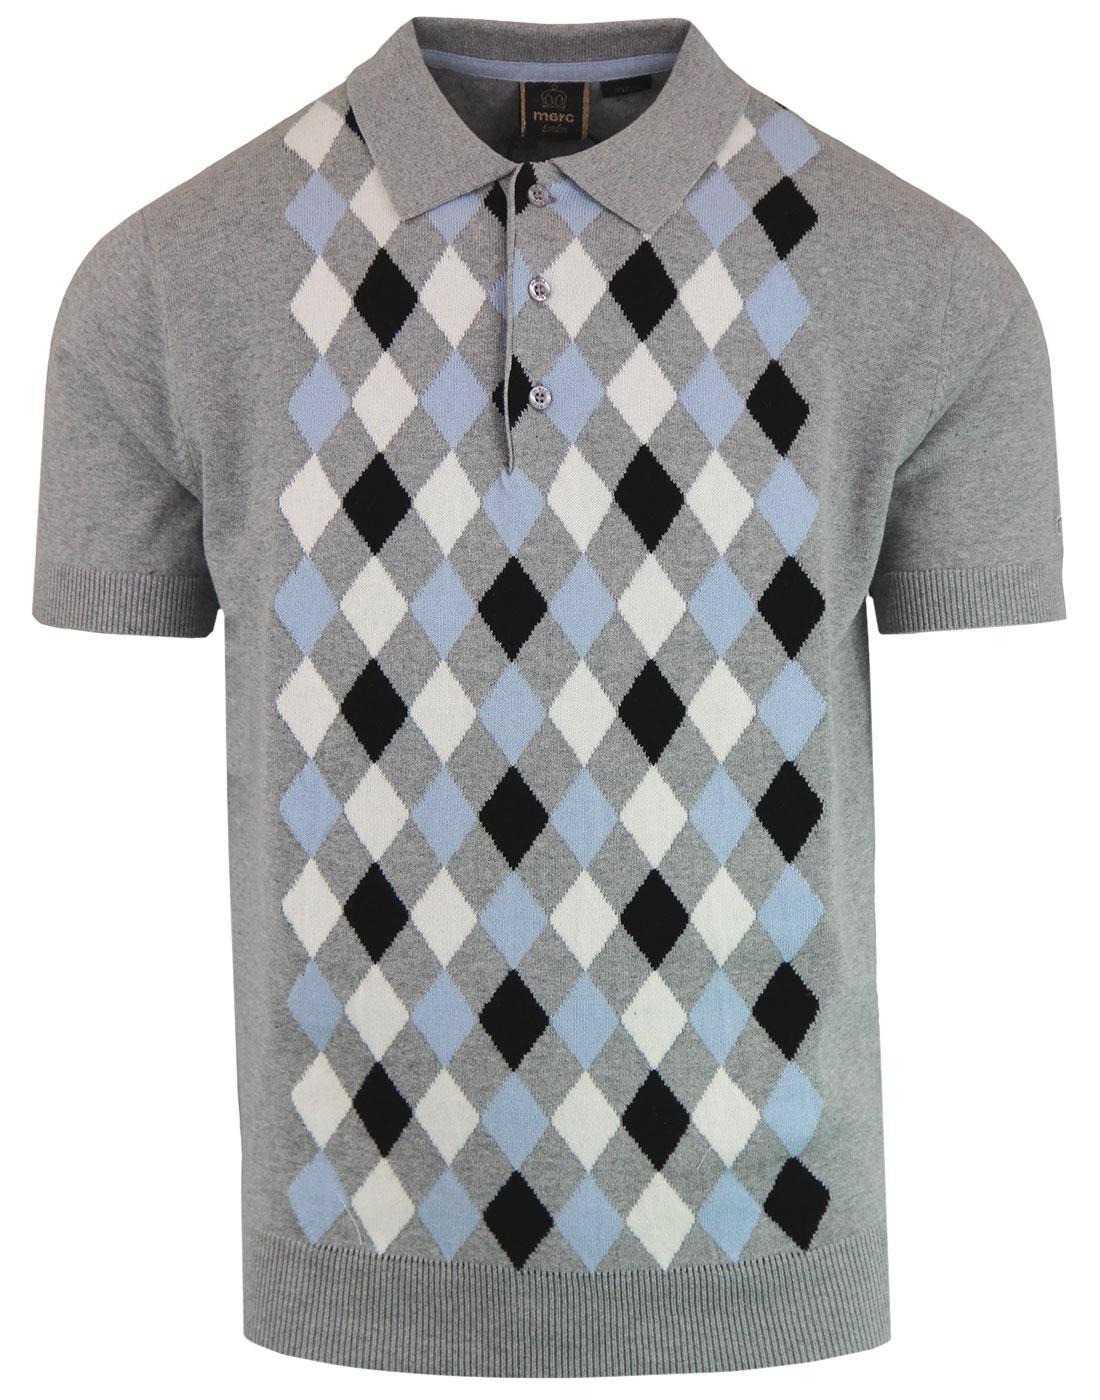 Echo MERC 1960s Mod Argyle Knitted Polo Shirt (GM)